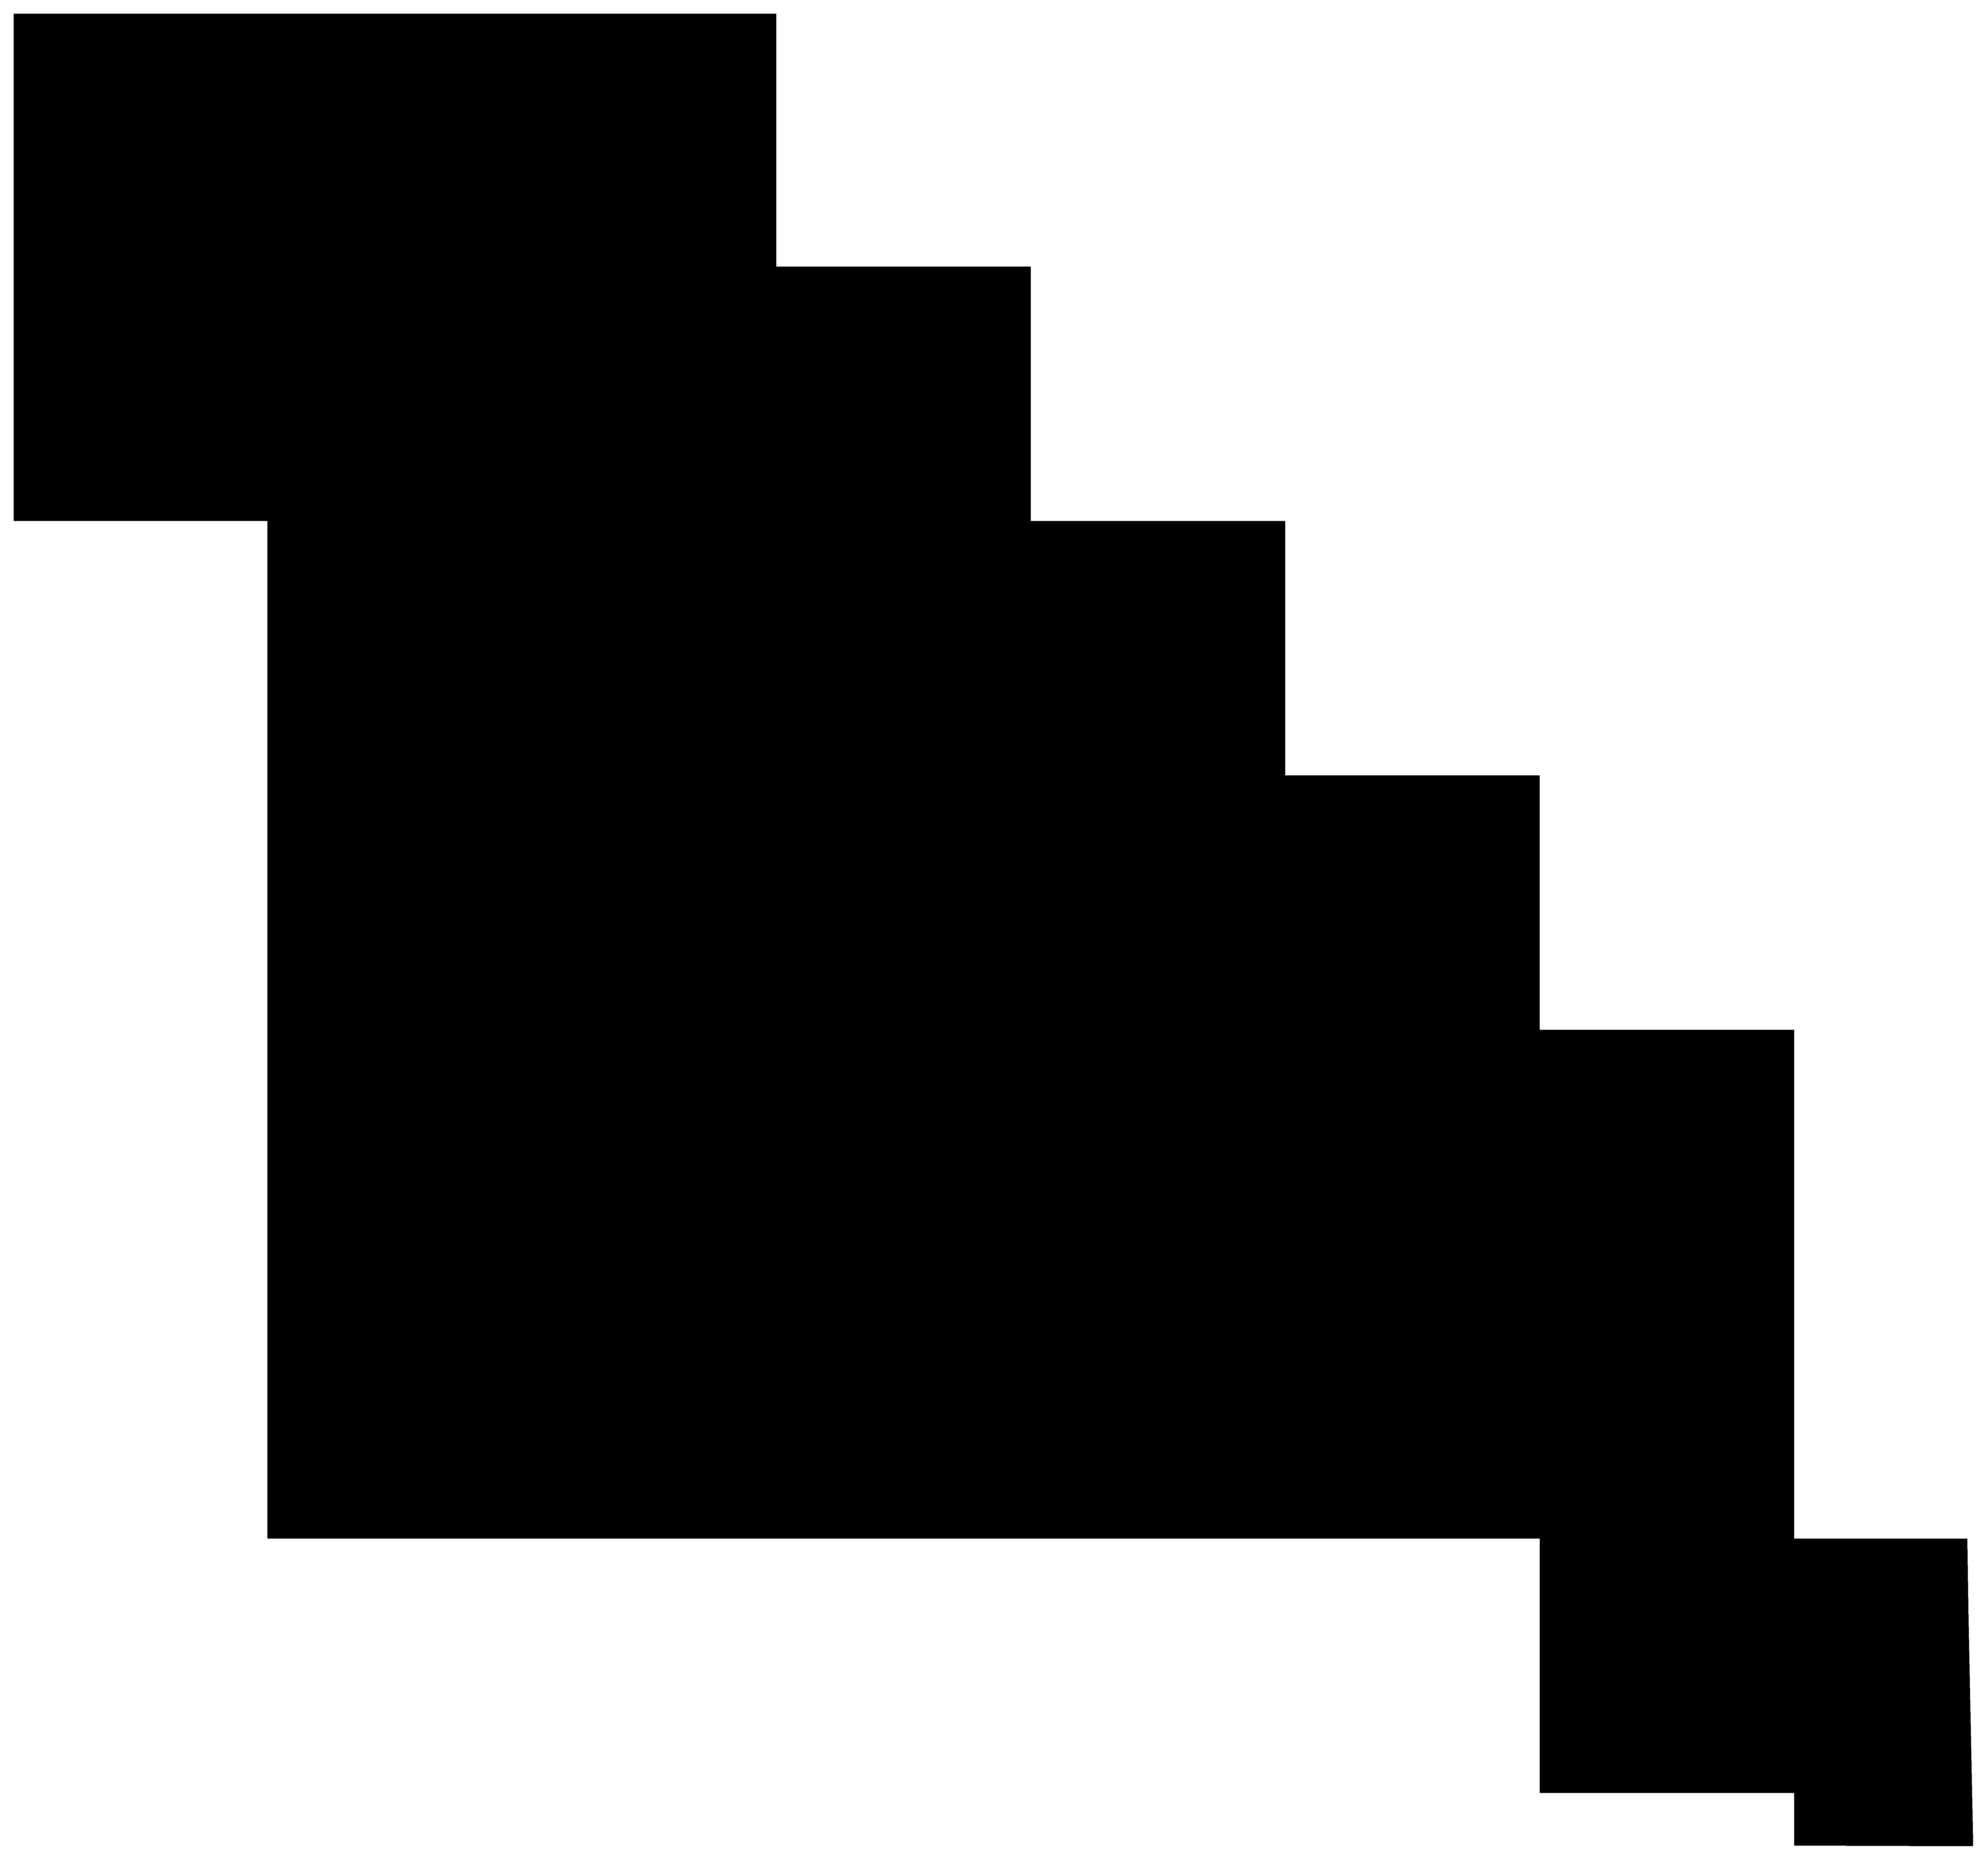 Png silhouette clip art. White clipart parrot